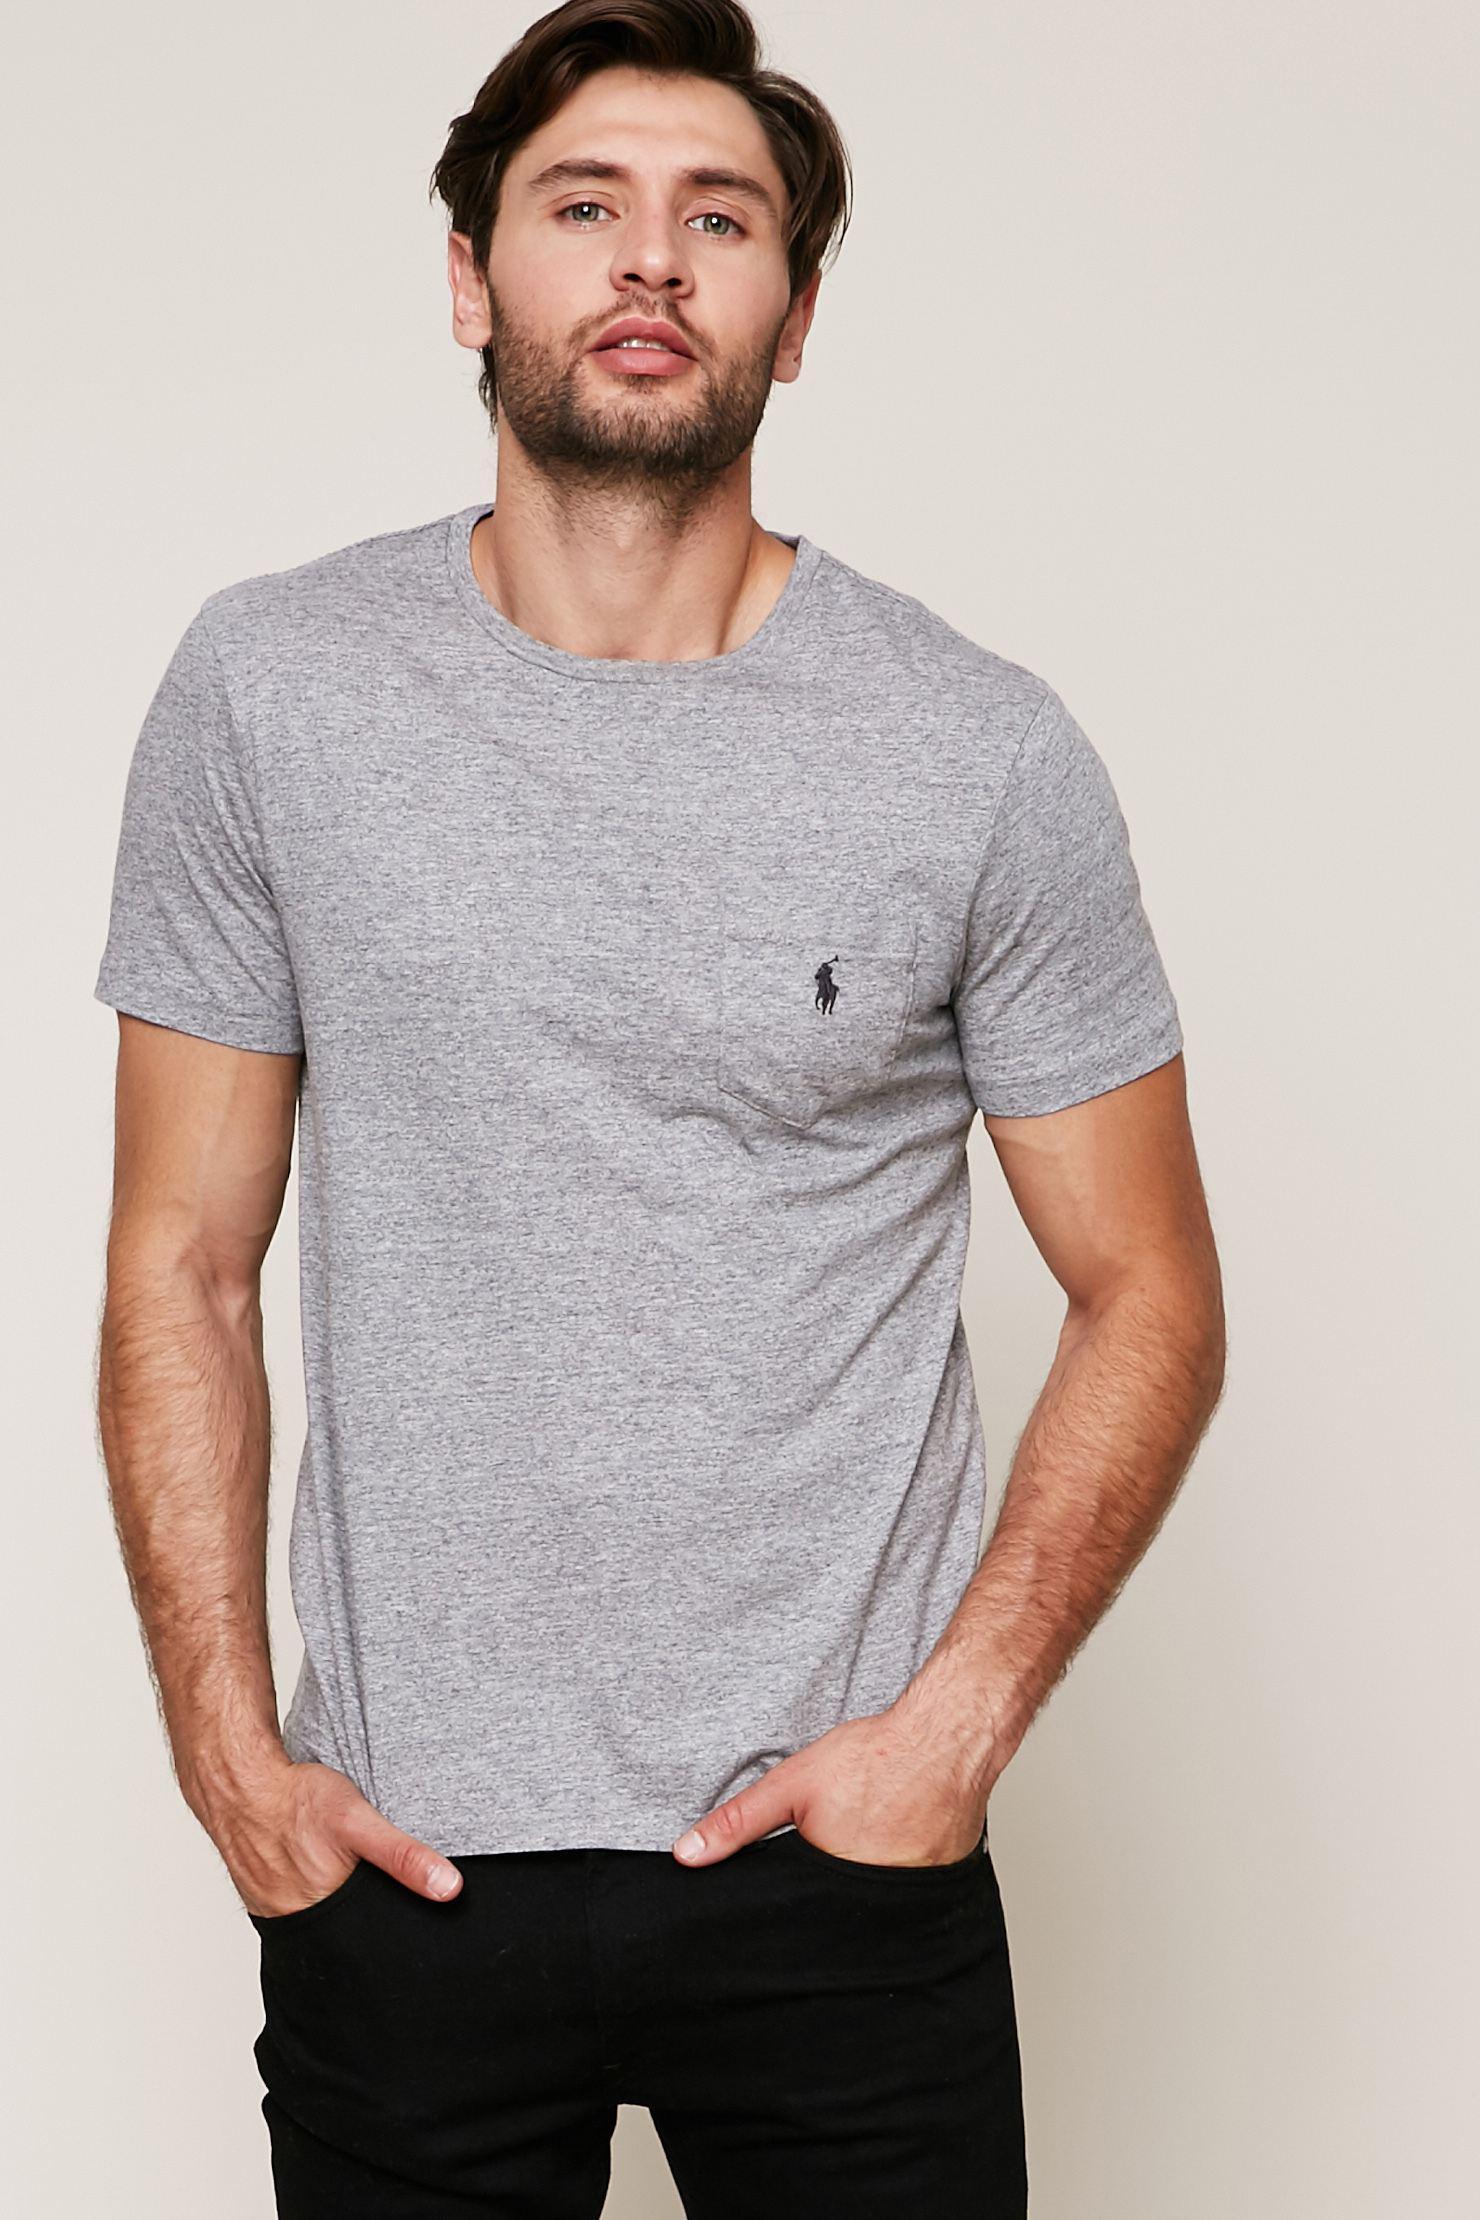 lyst polo ralph lauren t shirt in gray for men. Black Bedroom Furniture Sets. Home Design Ideas